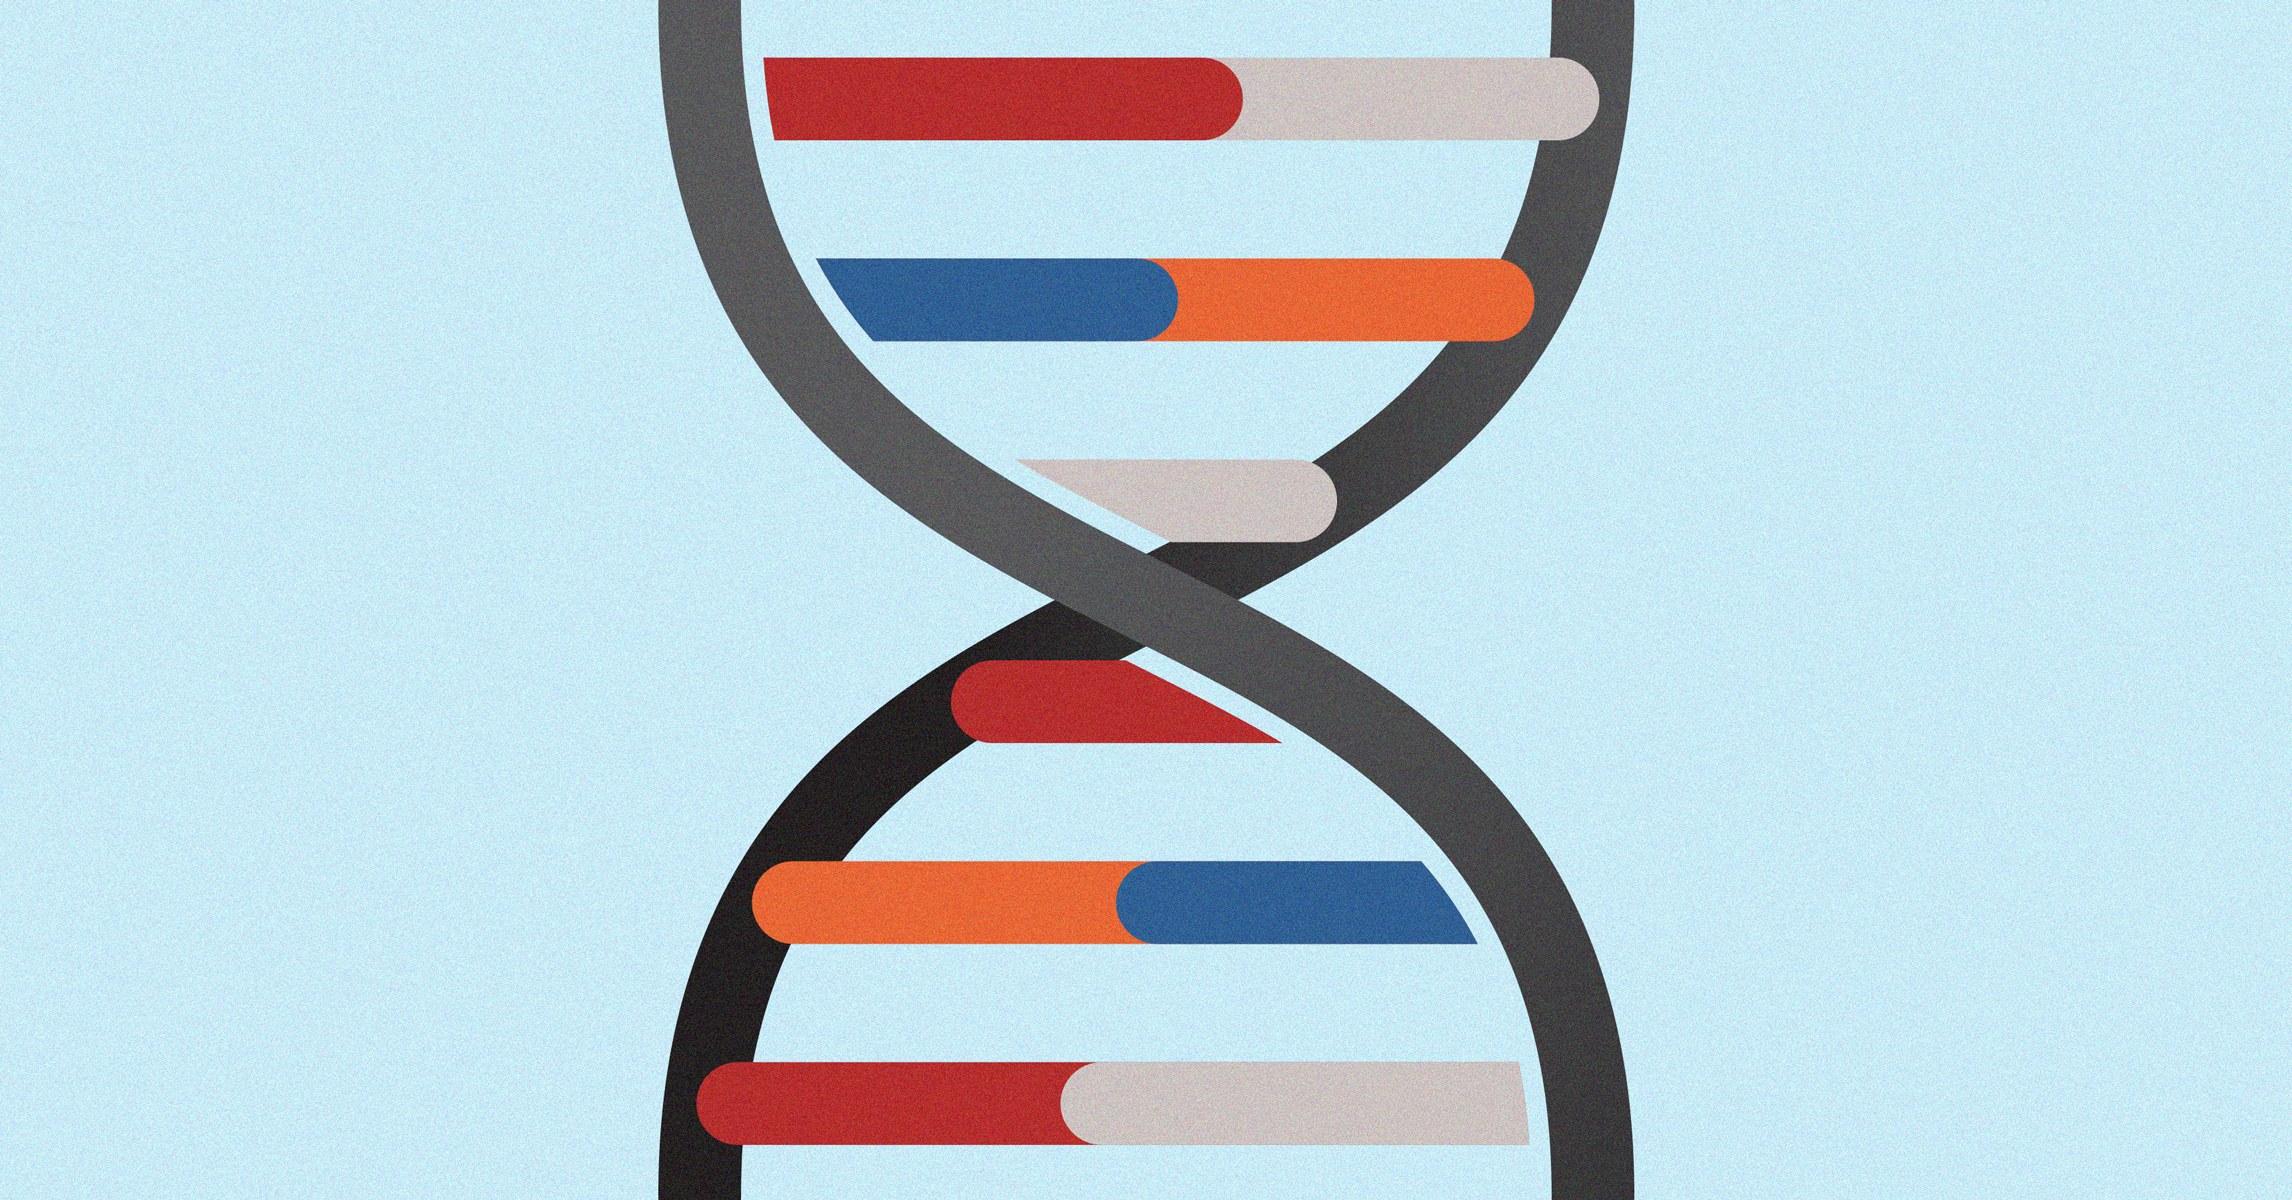 Single Base Editing Could Sharpen Crispr's Genetic Scalpel